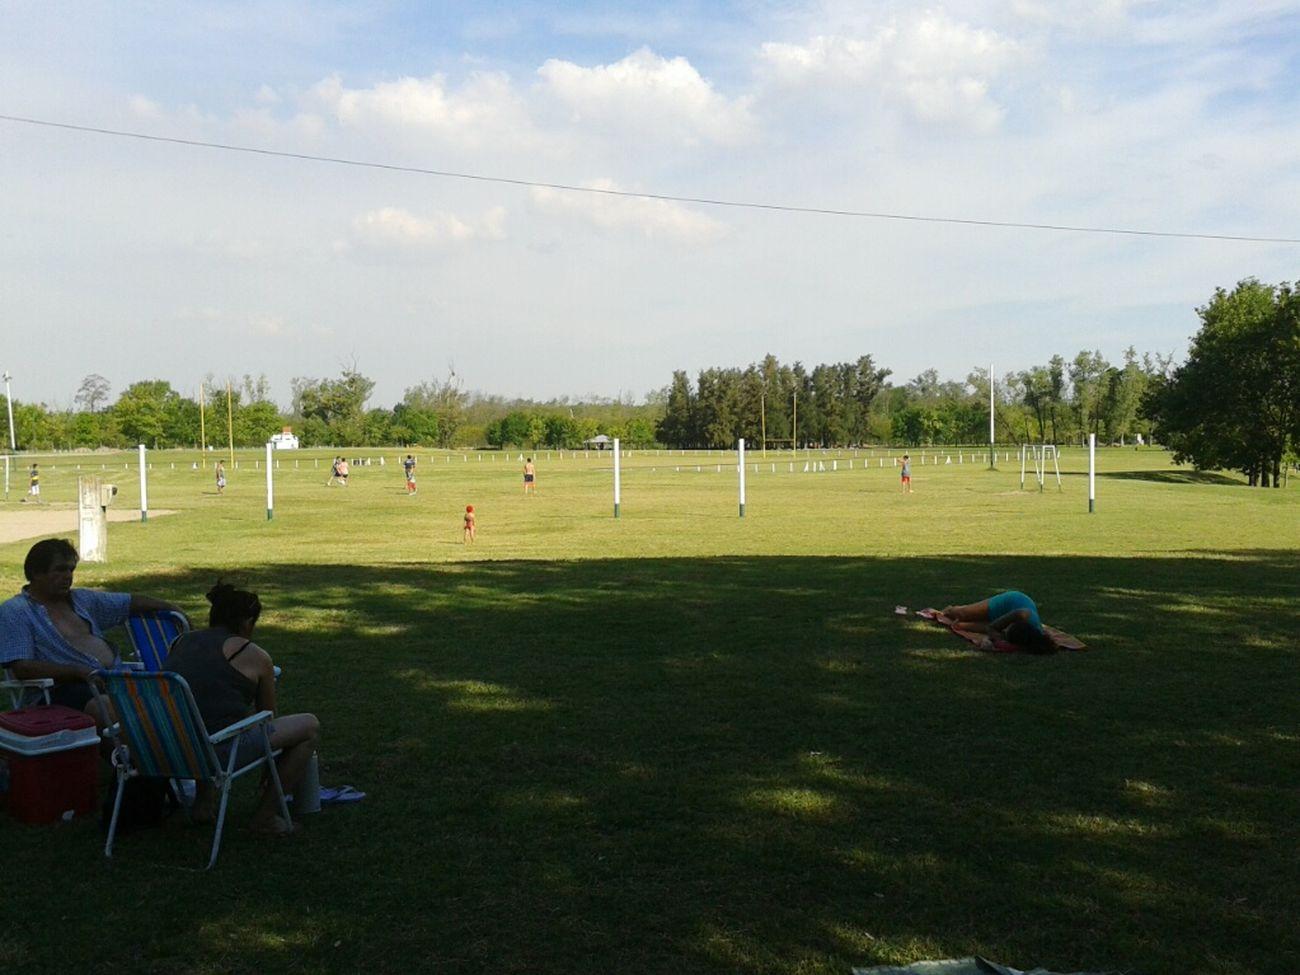 Relaxing + Relax + Futbol + Amigos + Family❤ + Hermoso Dia ☀ + Much Calor!!!